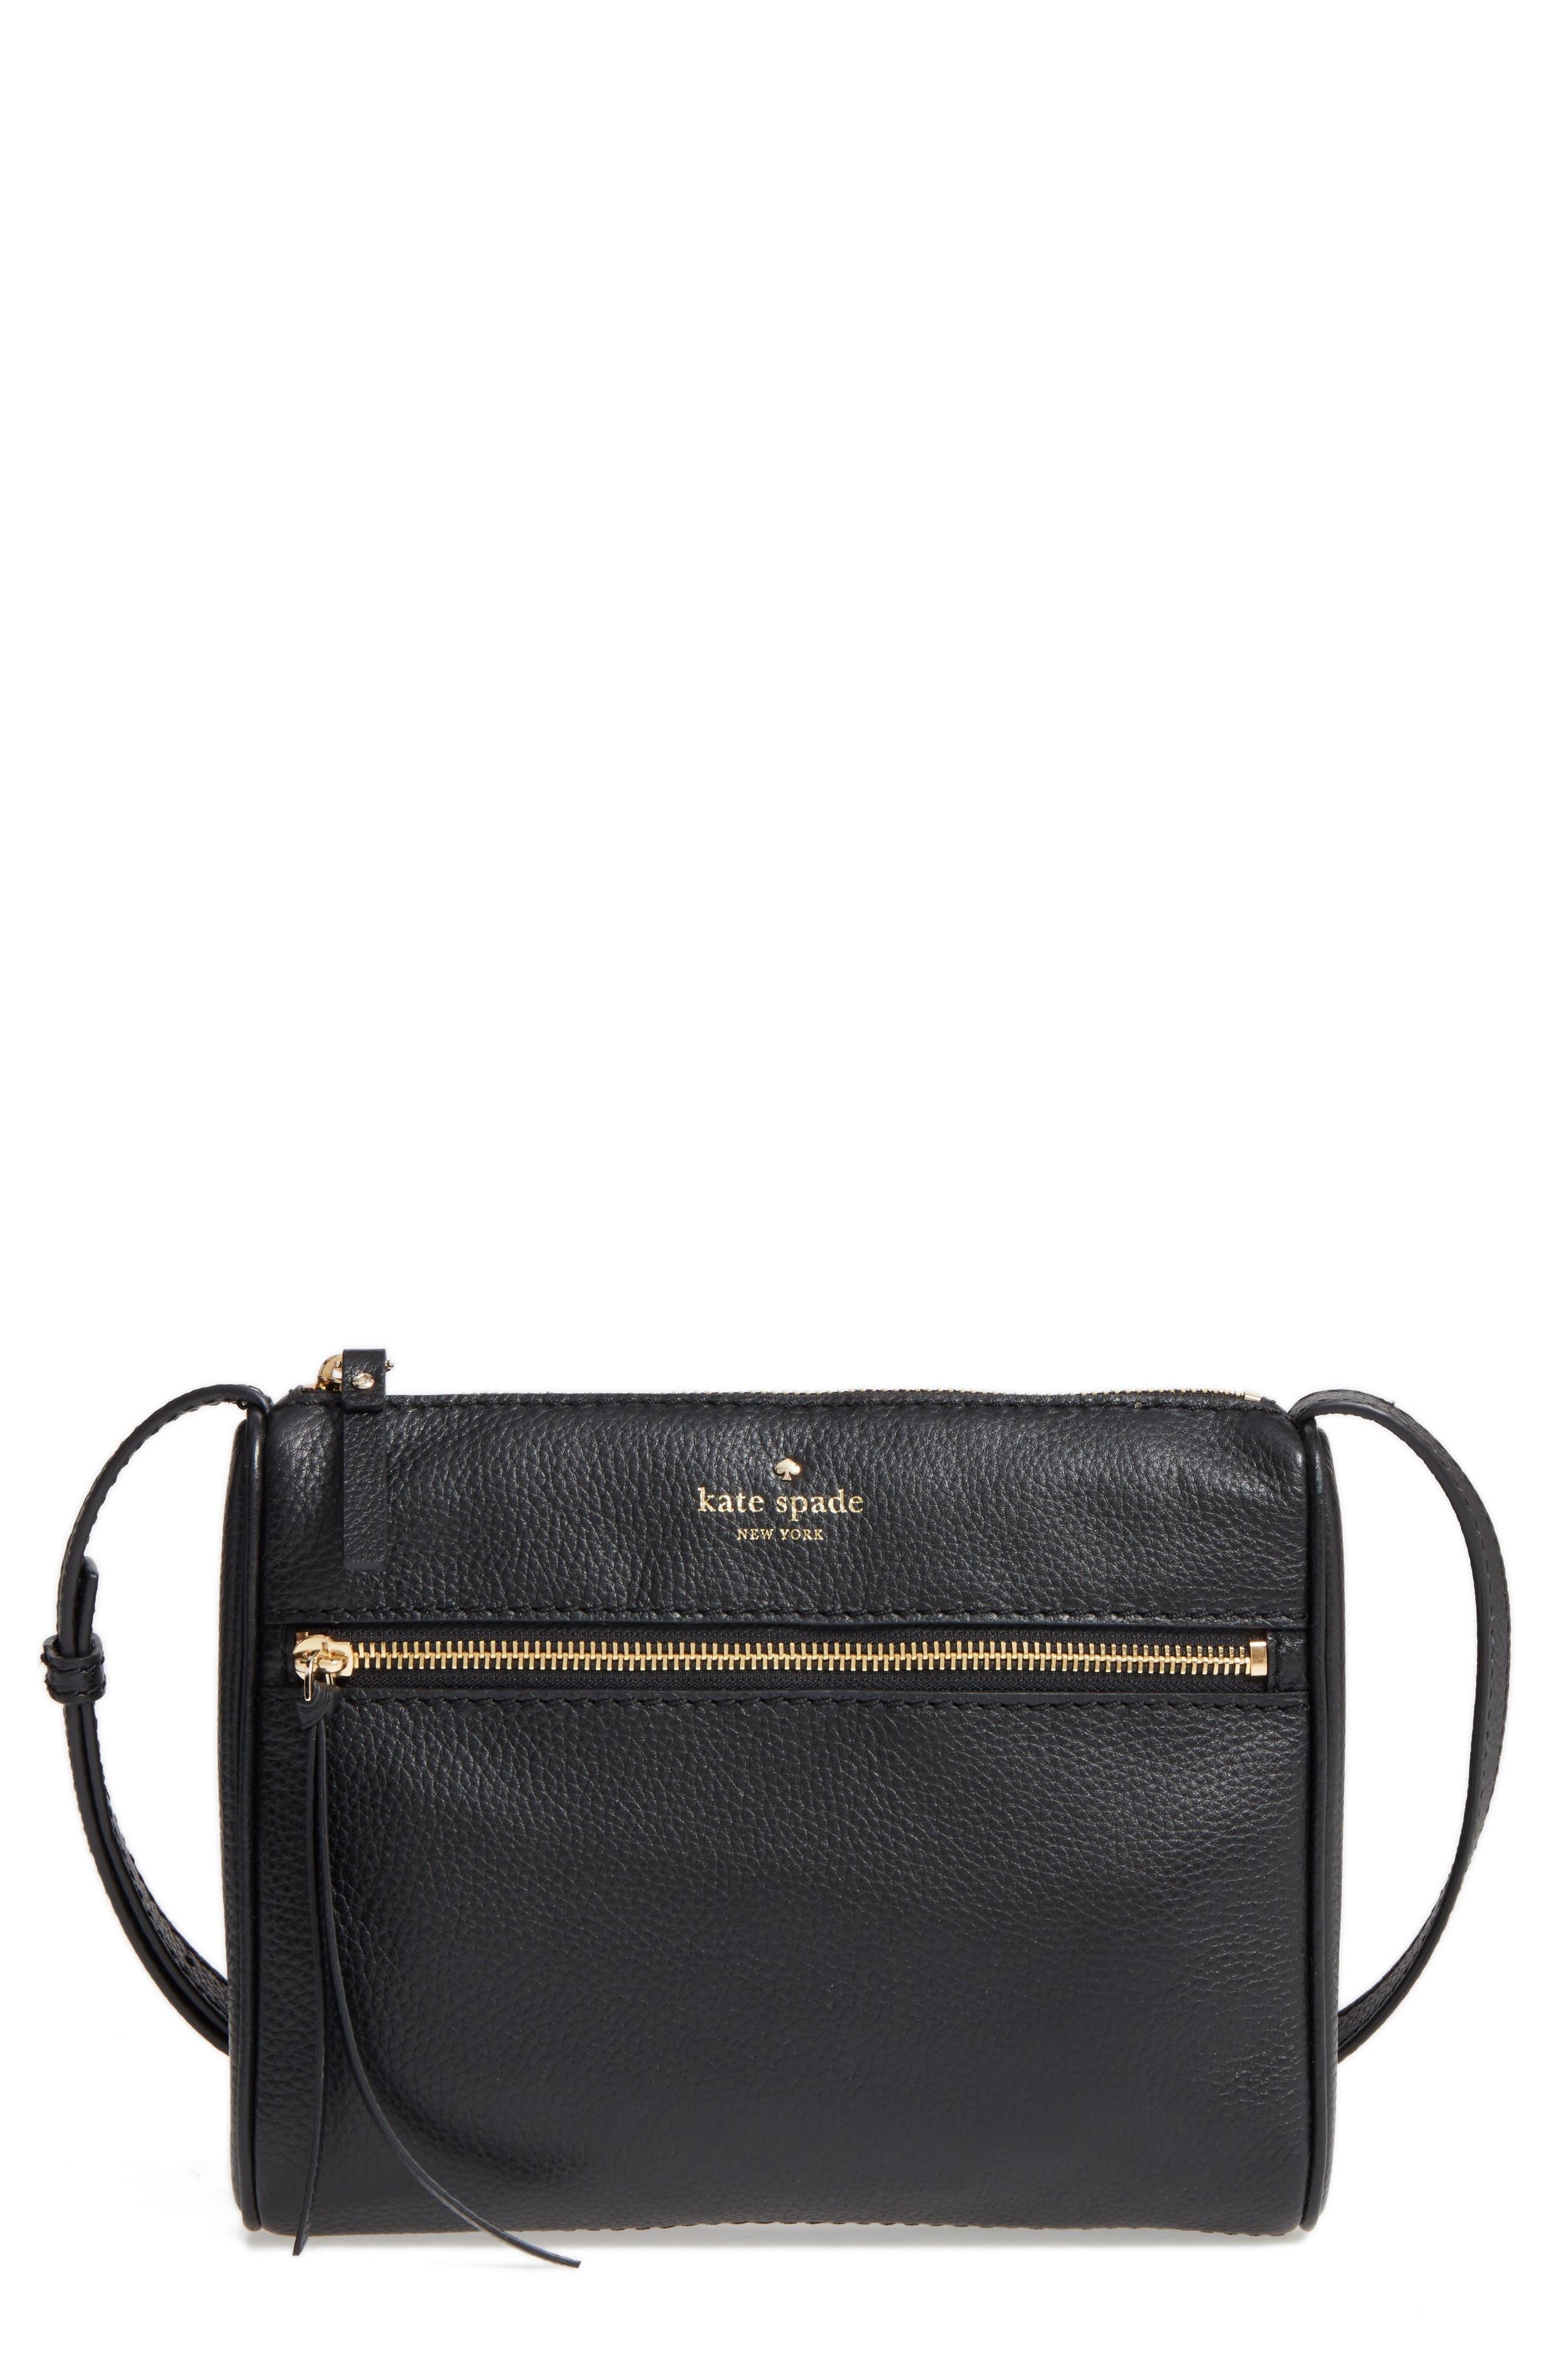 kate spade new york young lane - cayli leather crossbody bag